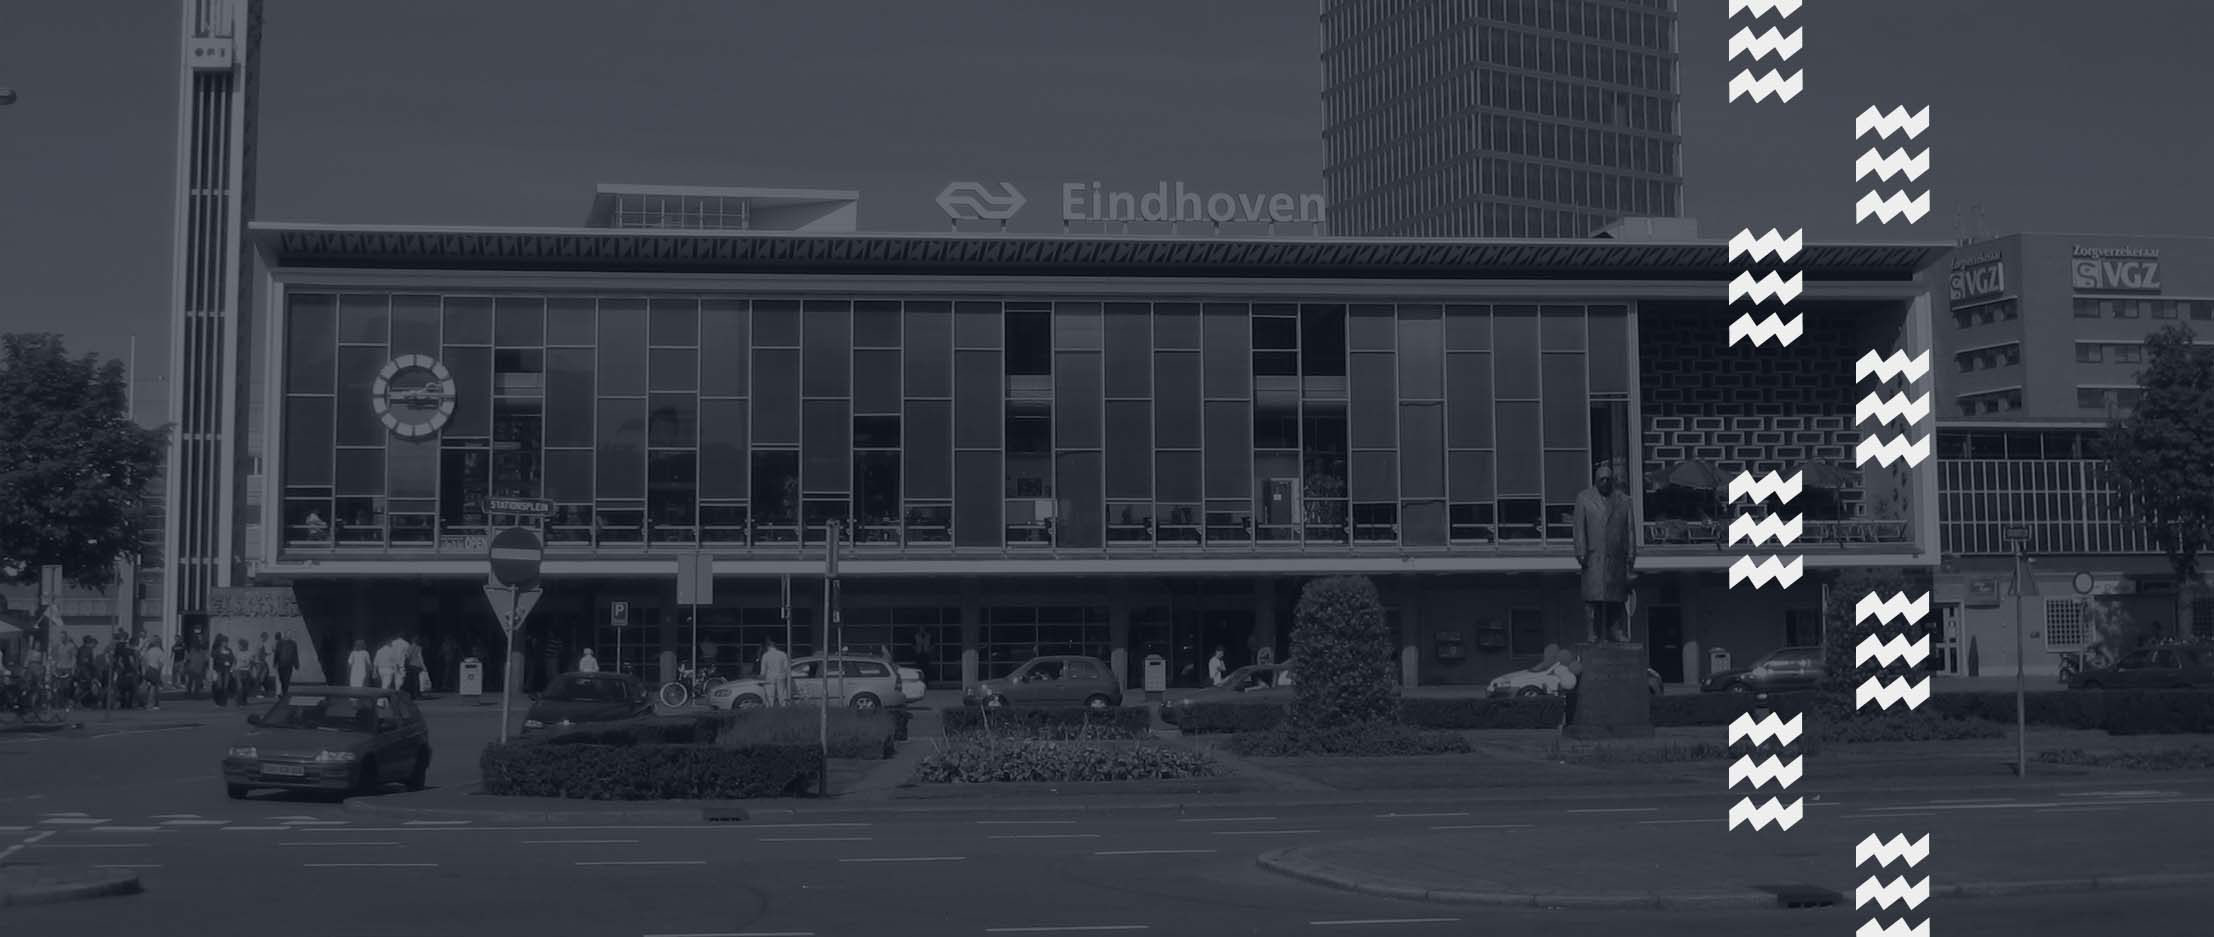 Braintax Eindhoven Taxi Station